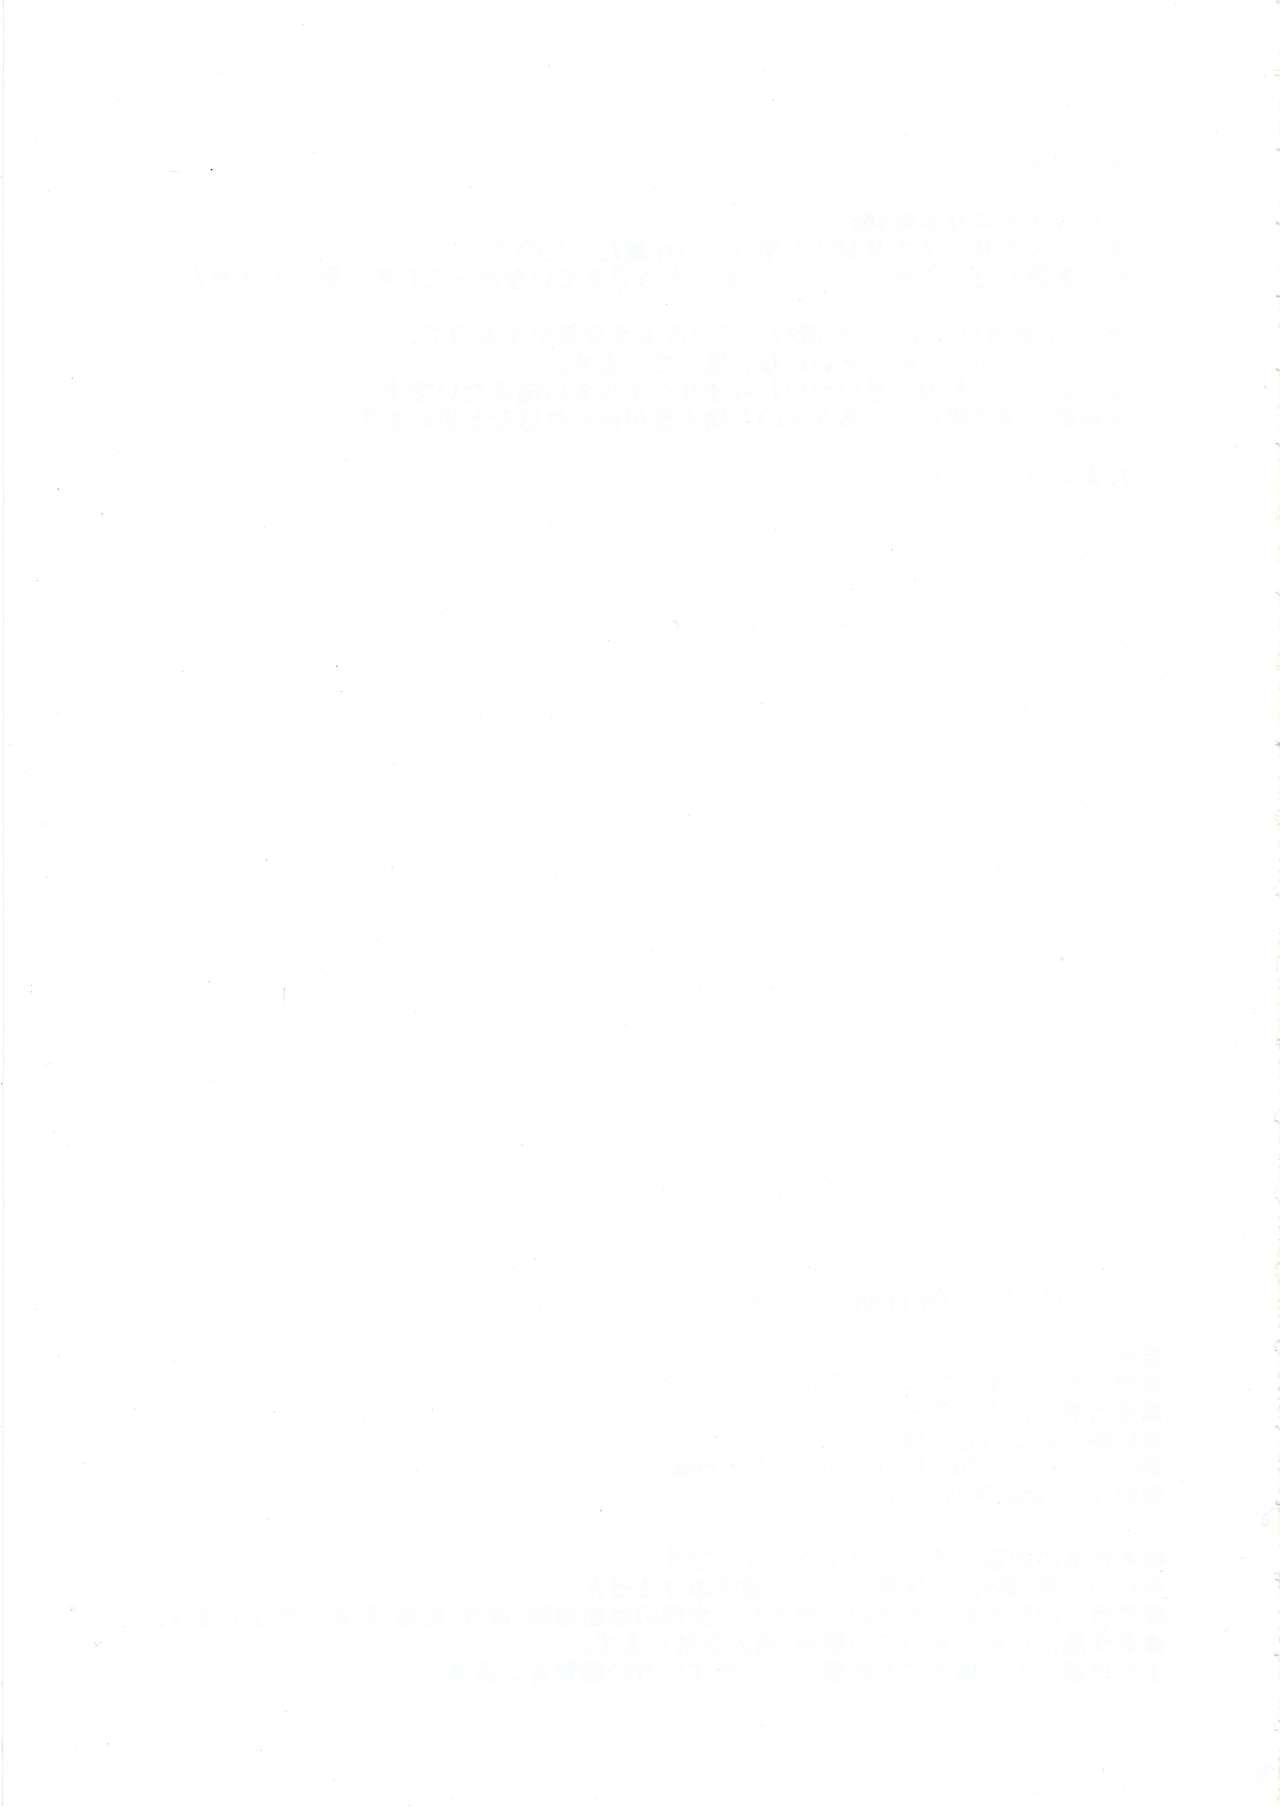 LittleBitchPlanet Vol. 4 + NKDC Vol. 11 25